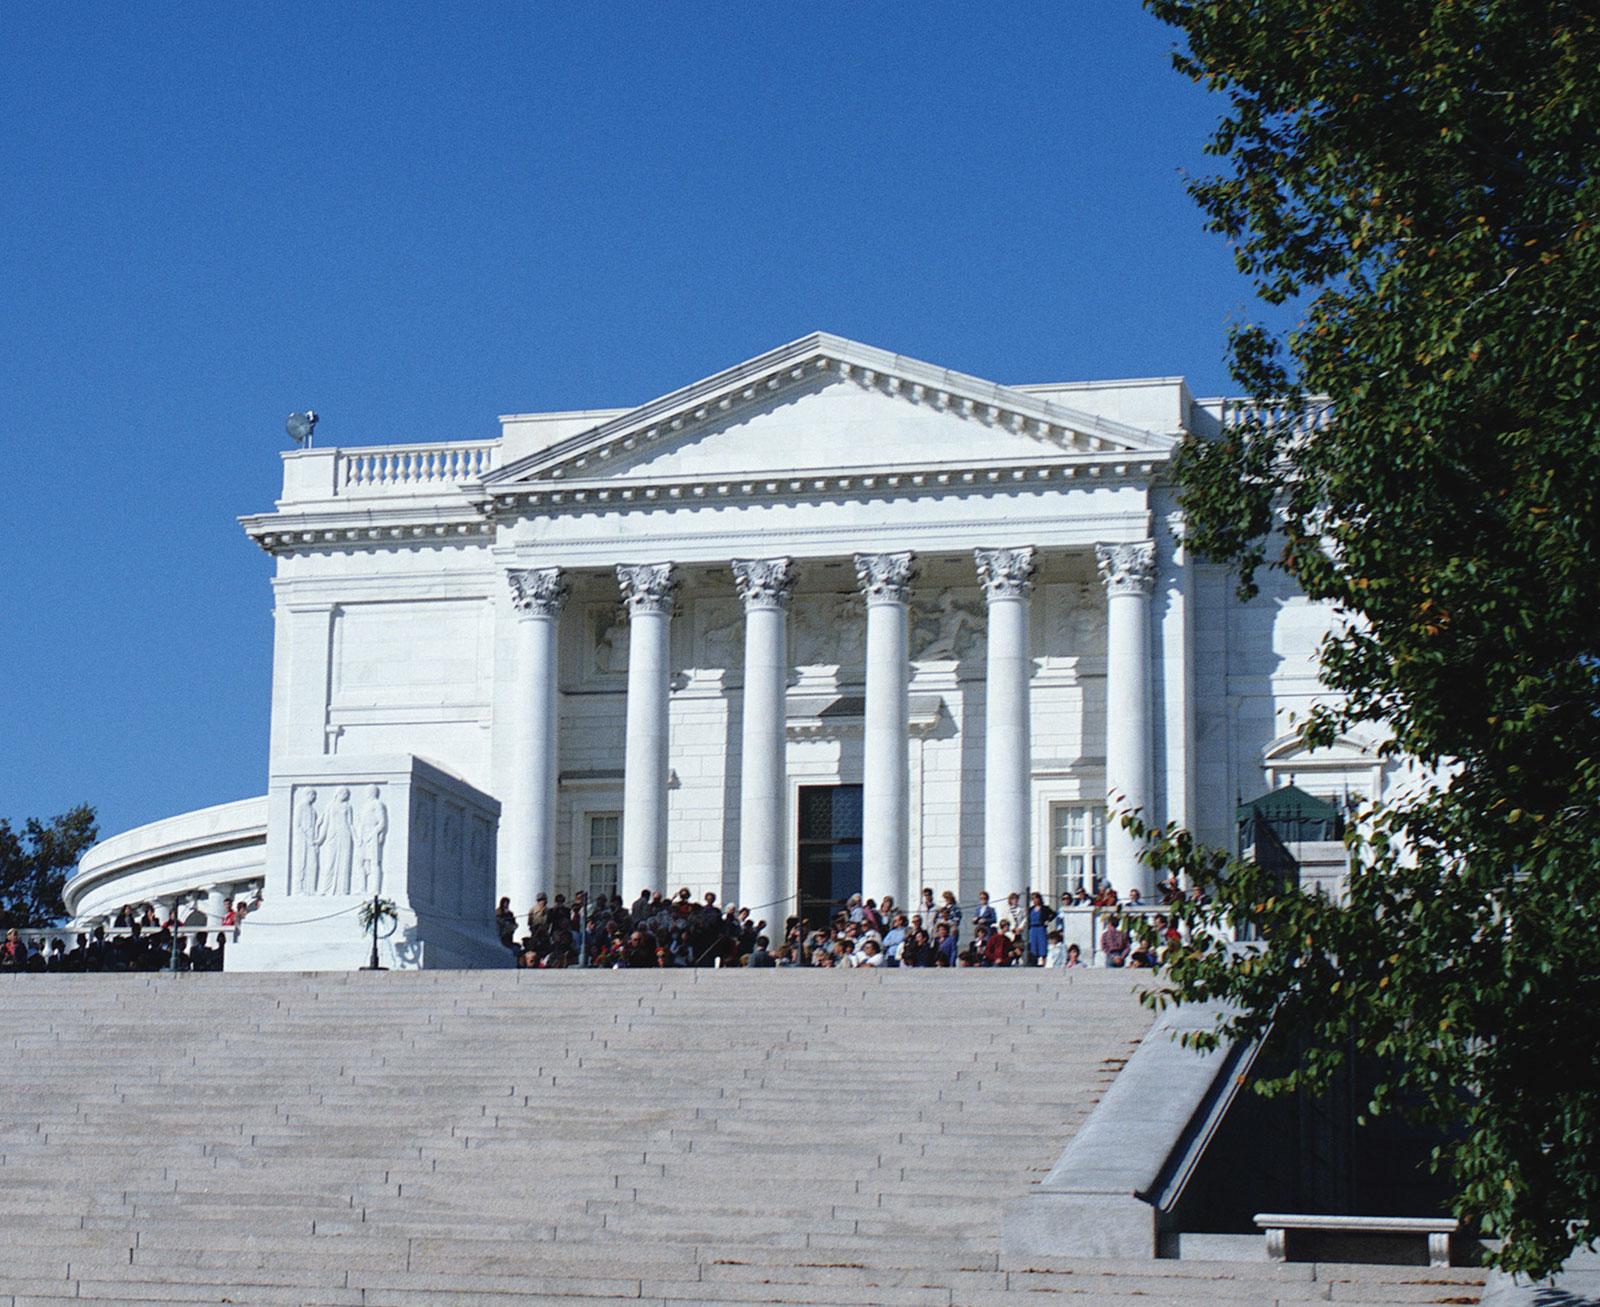 Monumen Bersejarah yang Dapat Anda Kunjungi, Salah Satunya Berada Di Washington DC